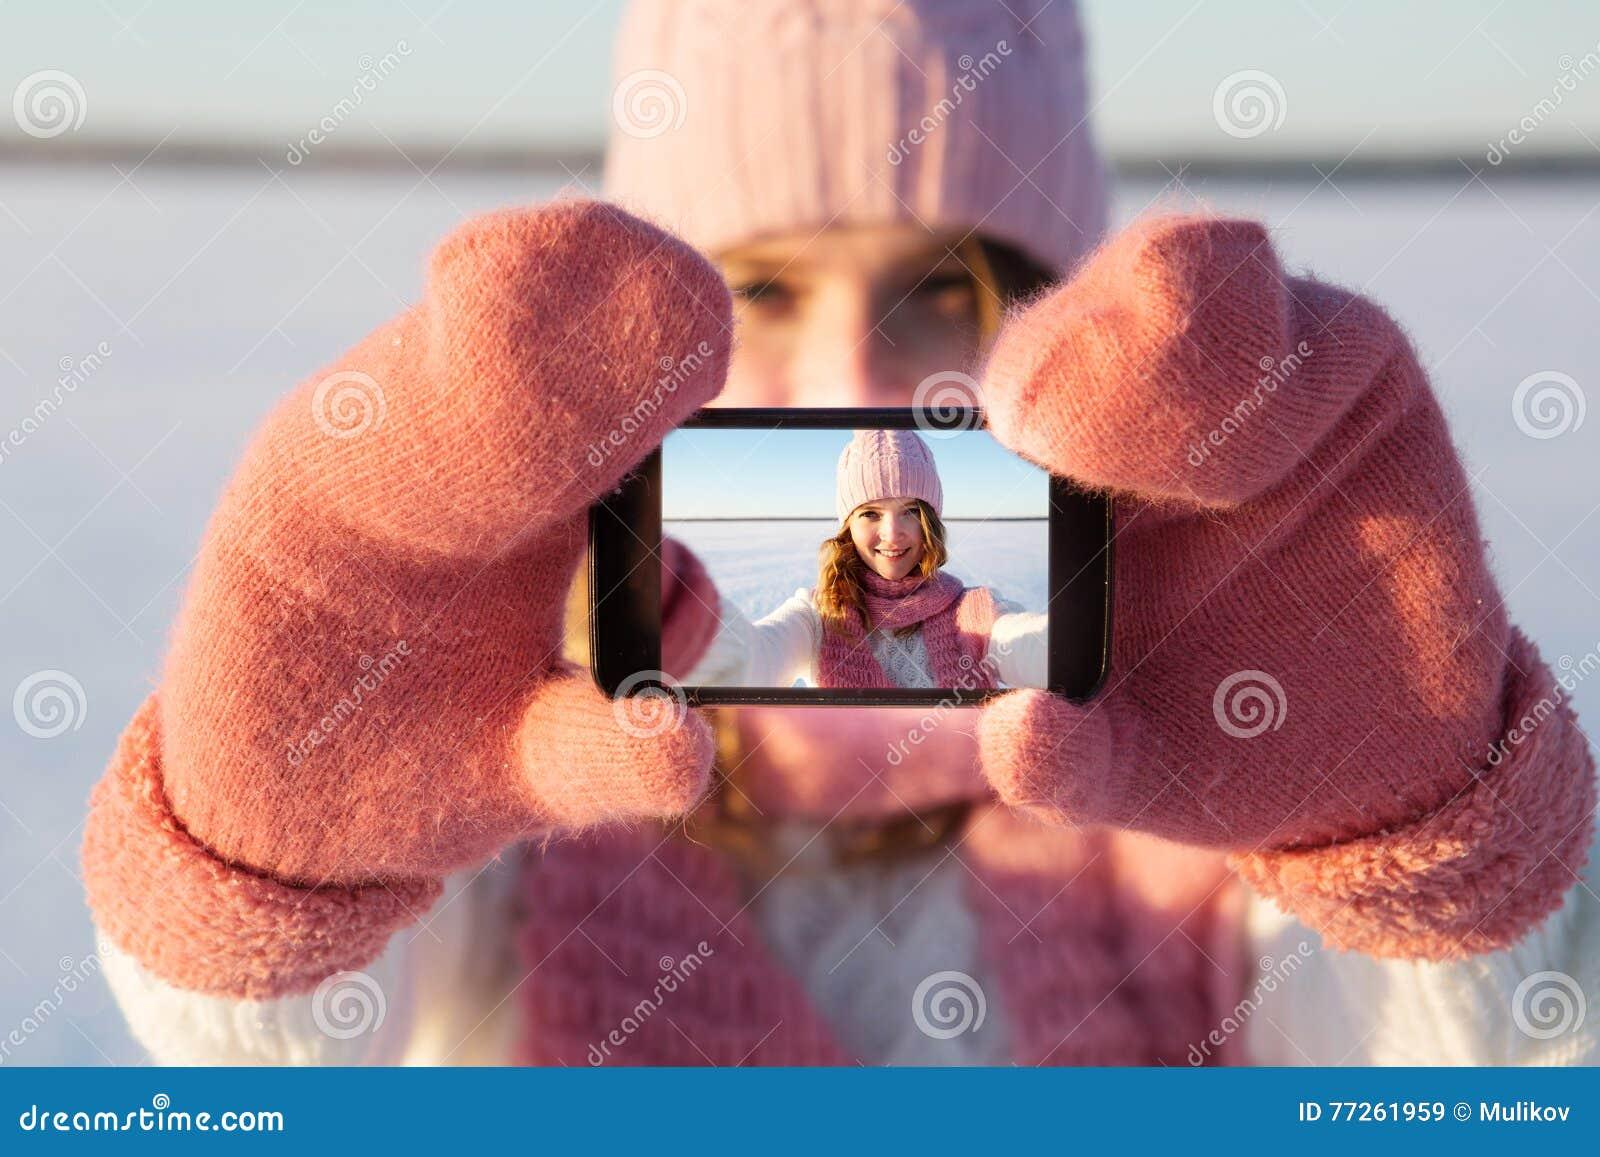 Pretty young female tourist takes selfie in winter